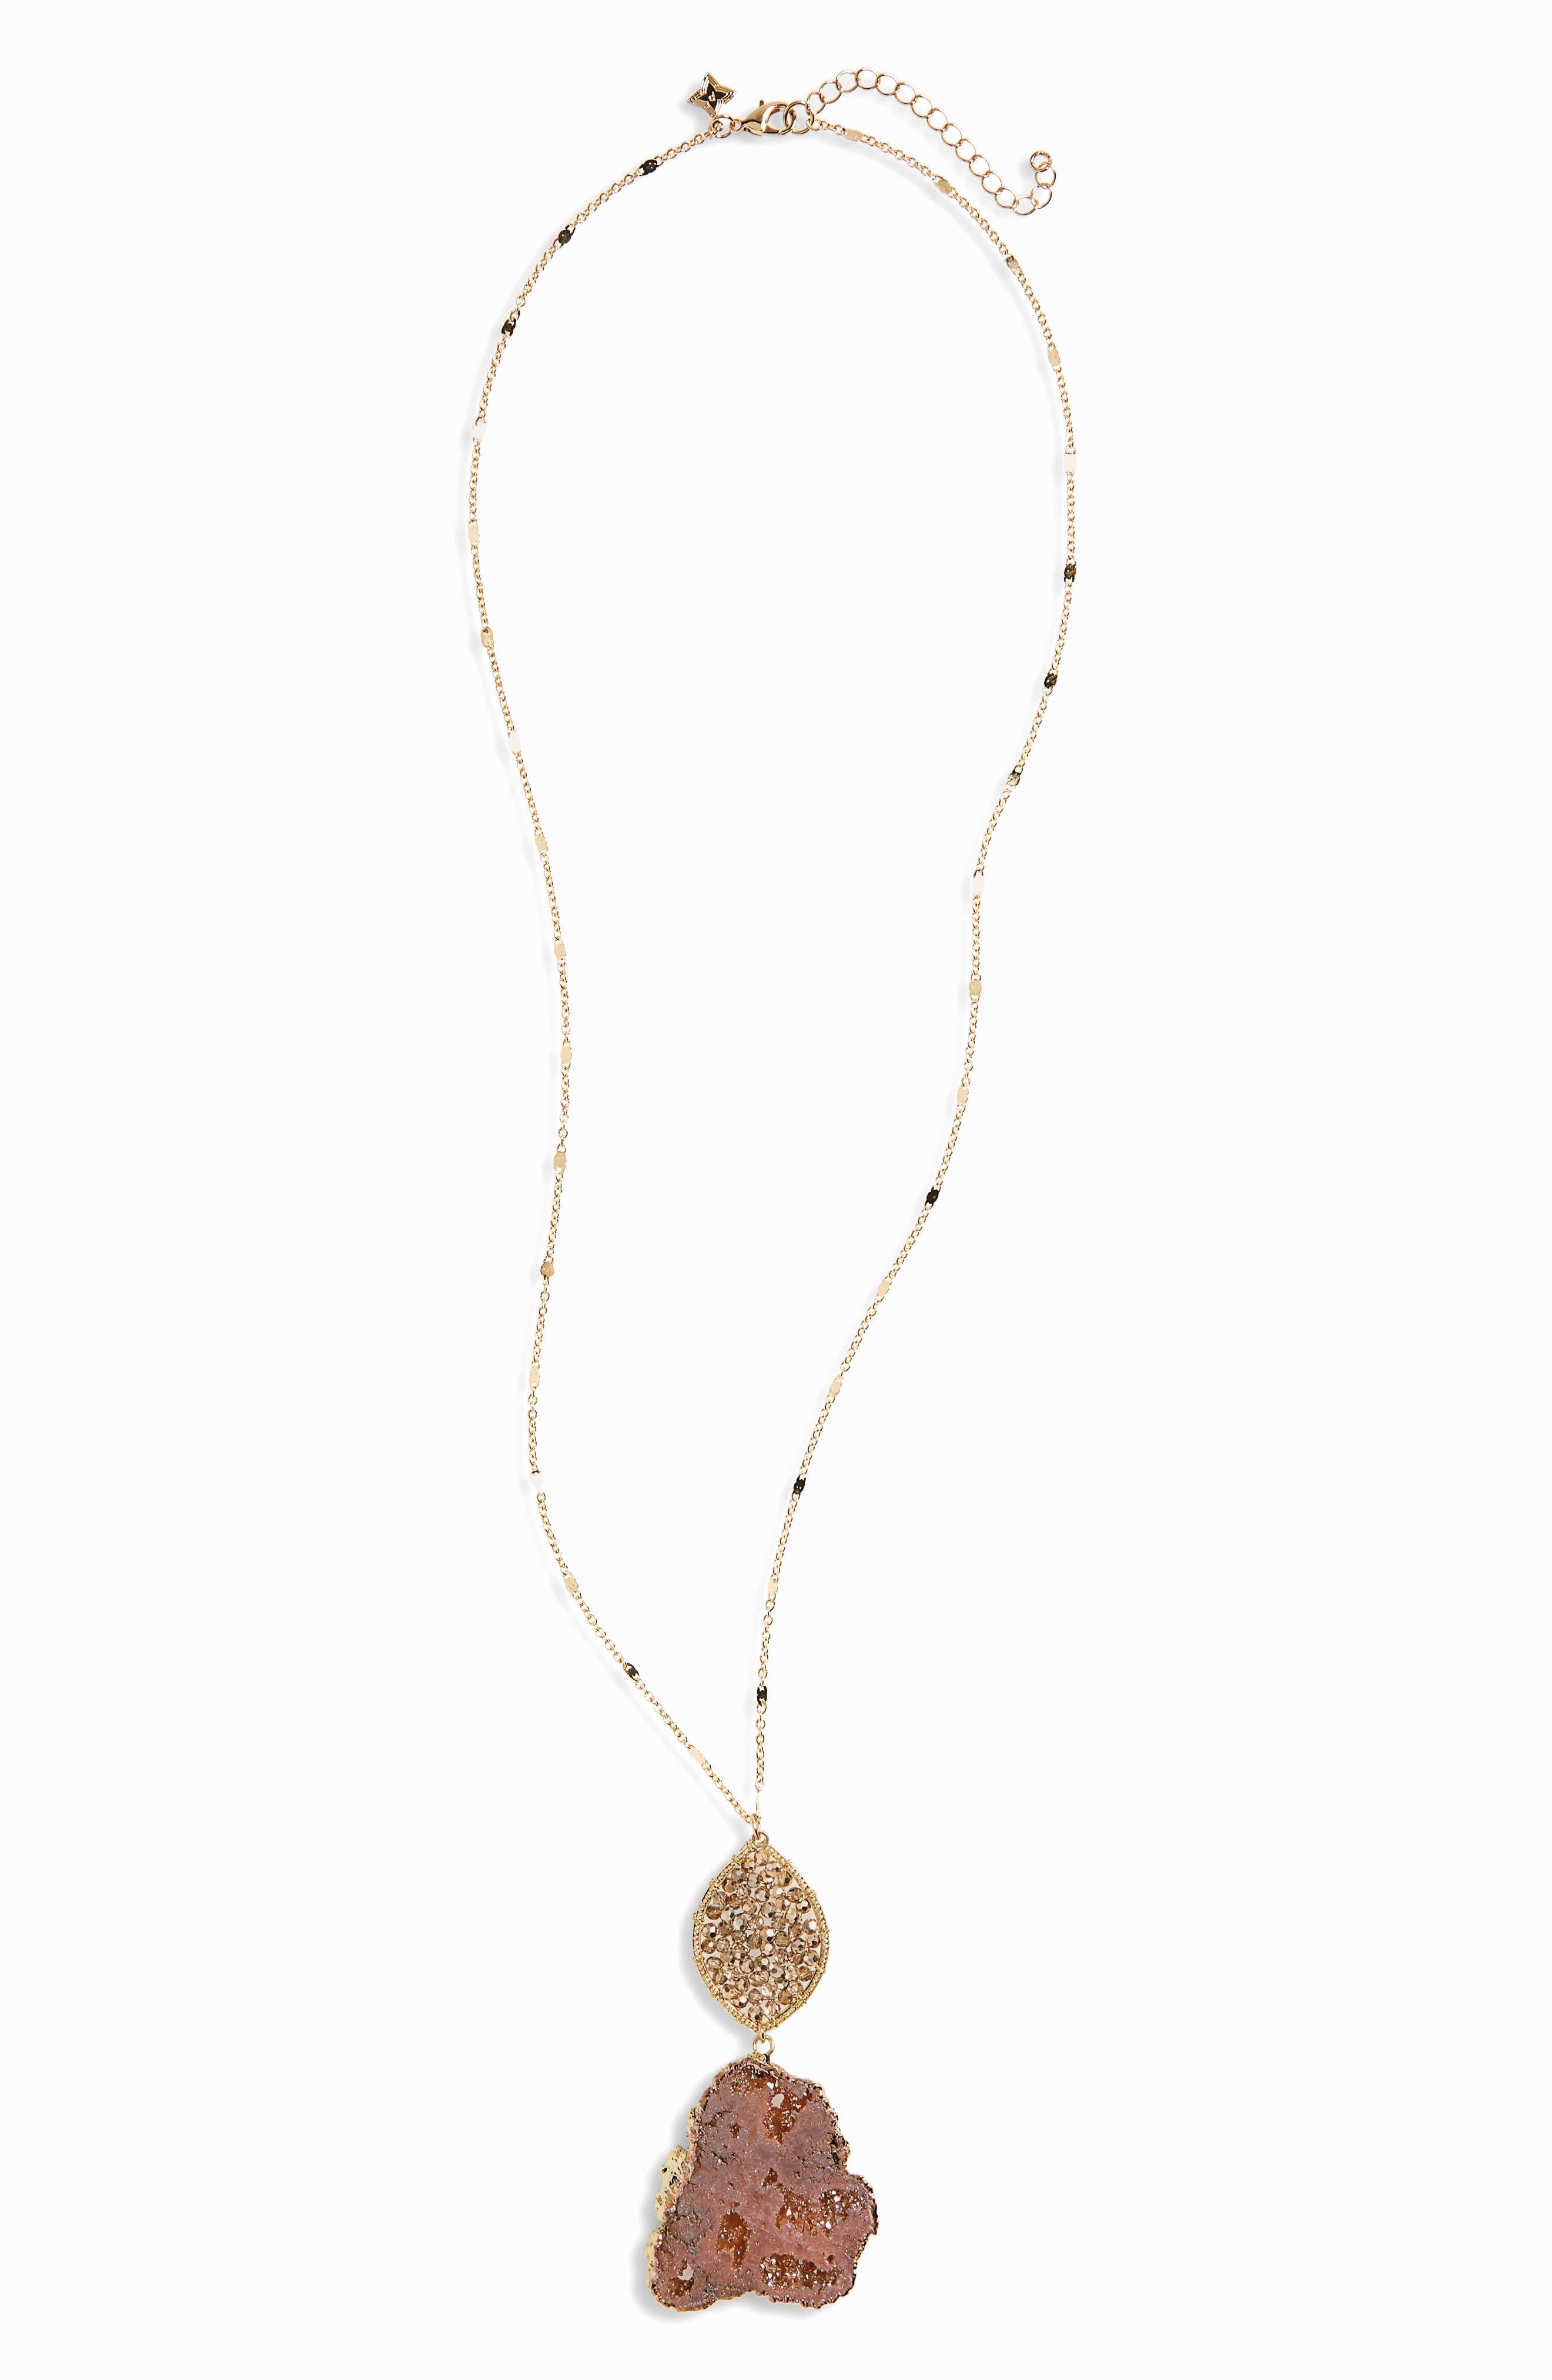 Agate Beaded Pendant Necklace,                             Main thumbnail 1, color,                             Peach